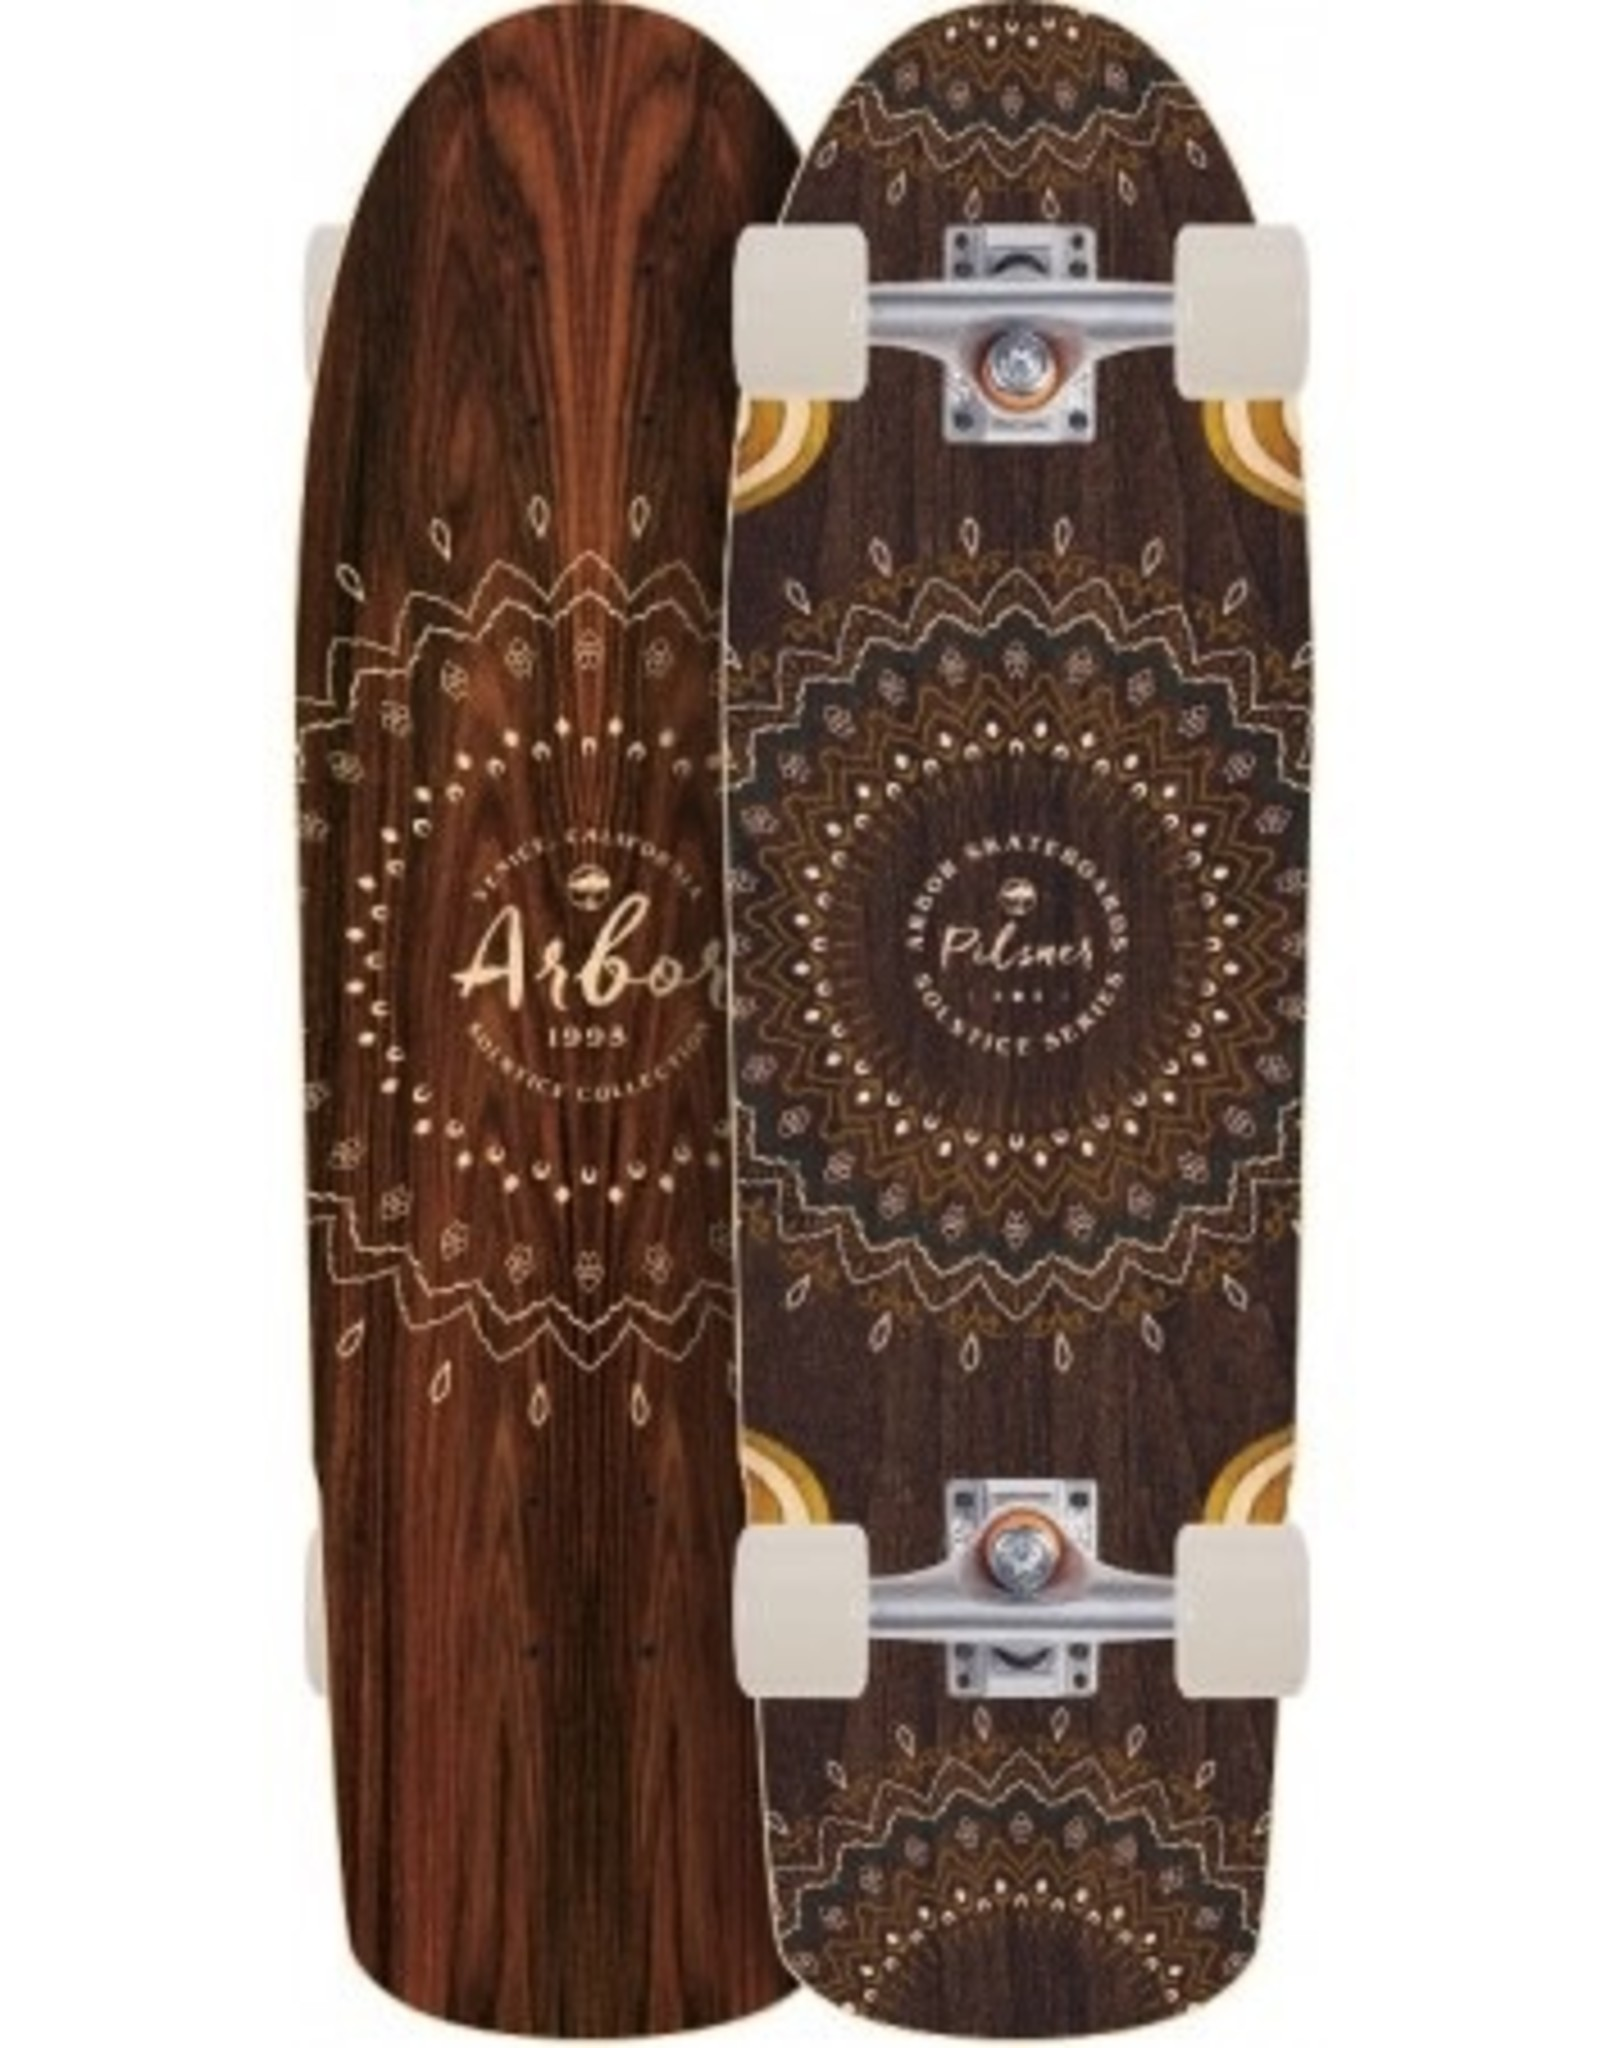 GLOBE Arbor Pilsner Solstice Longboard Skateboard Complete 2017